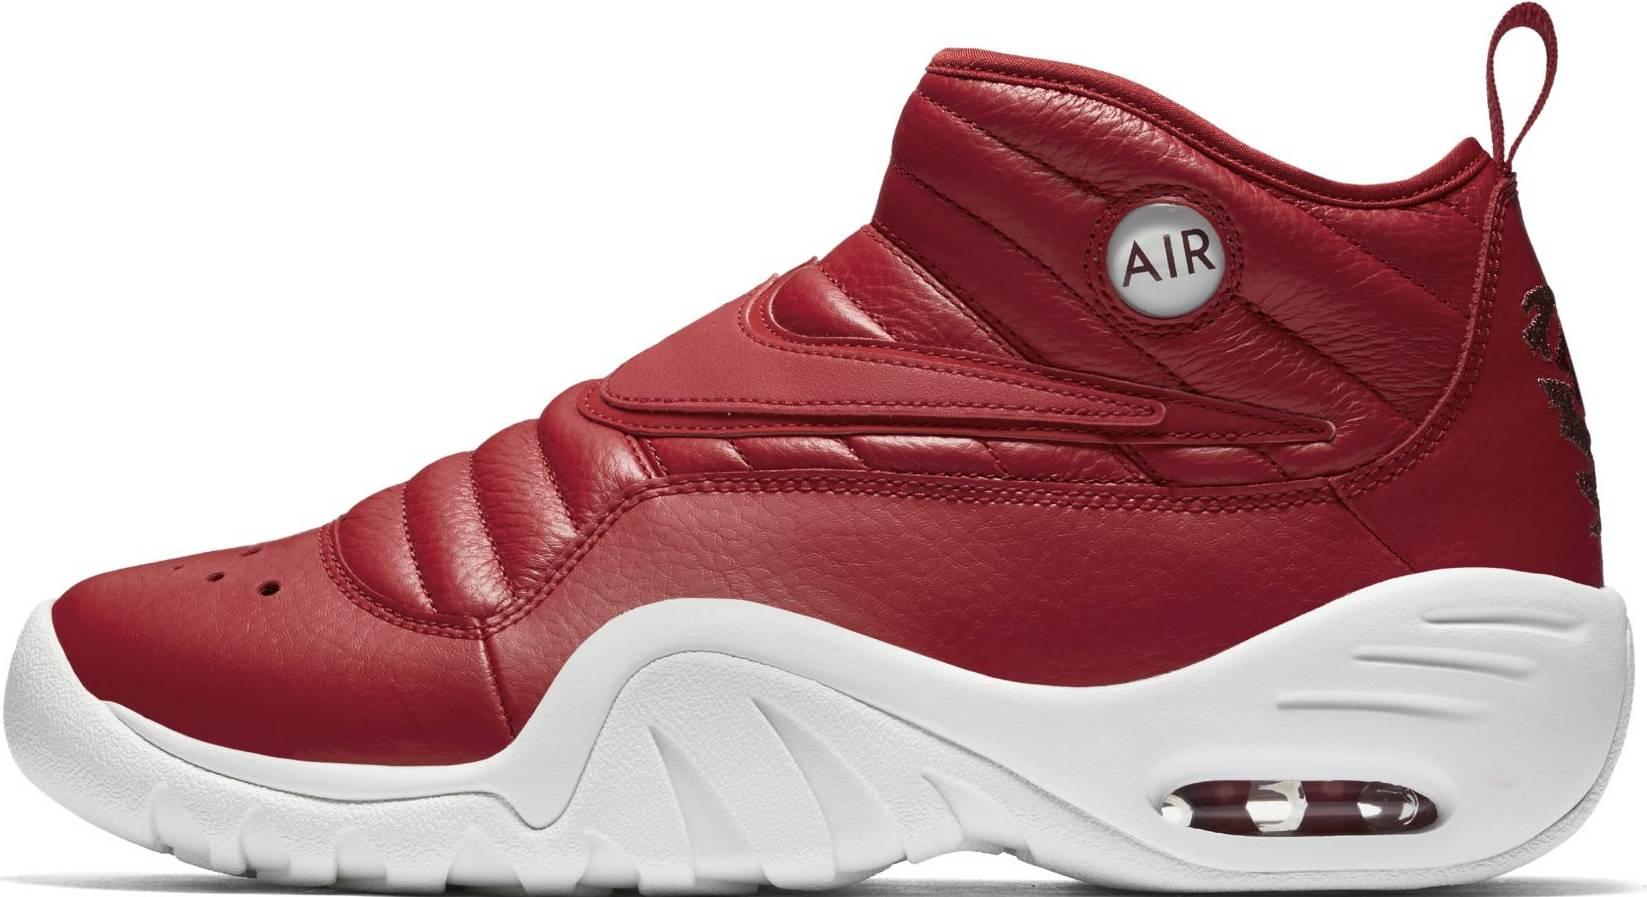 Review of Nike Air Shake Ndestrukt